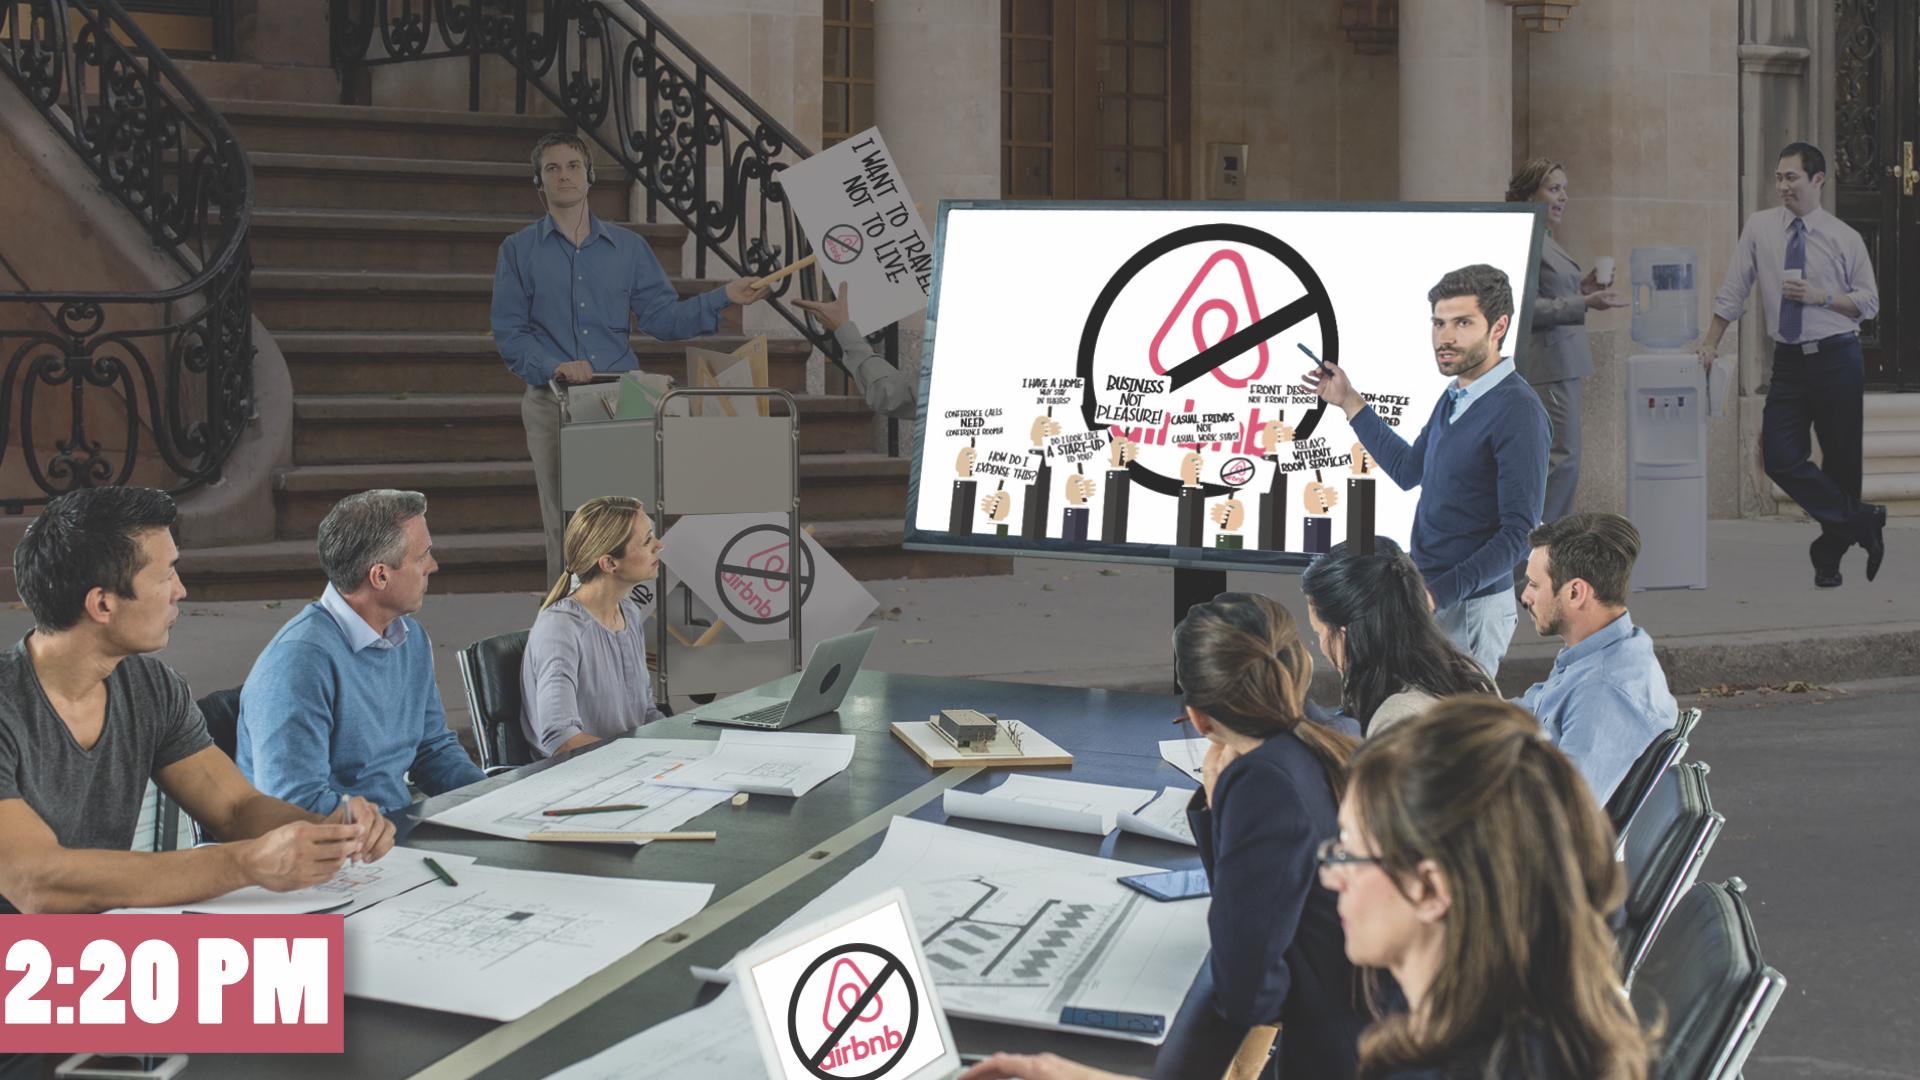 Re-Agenda: The Powerpoint